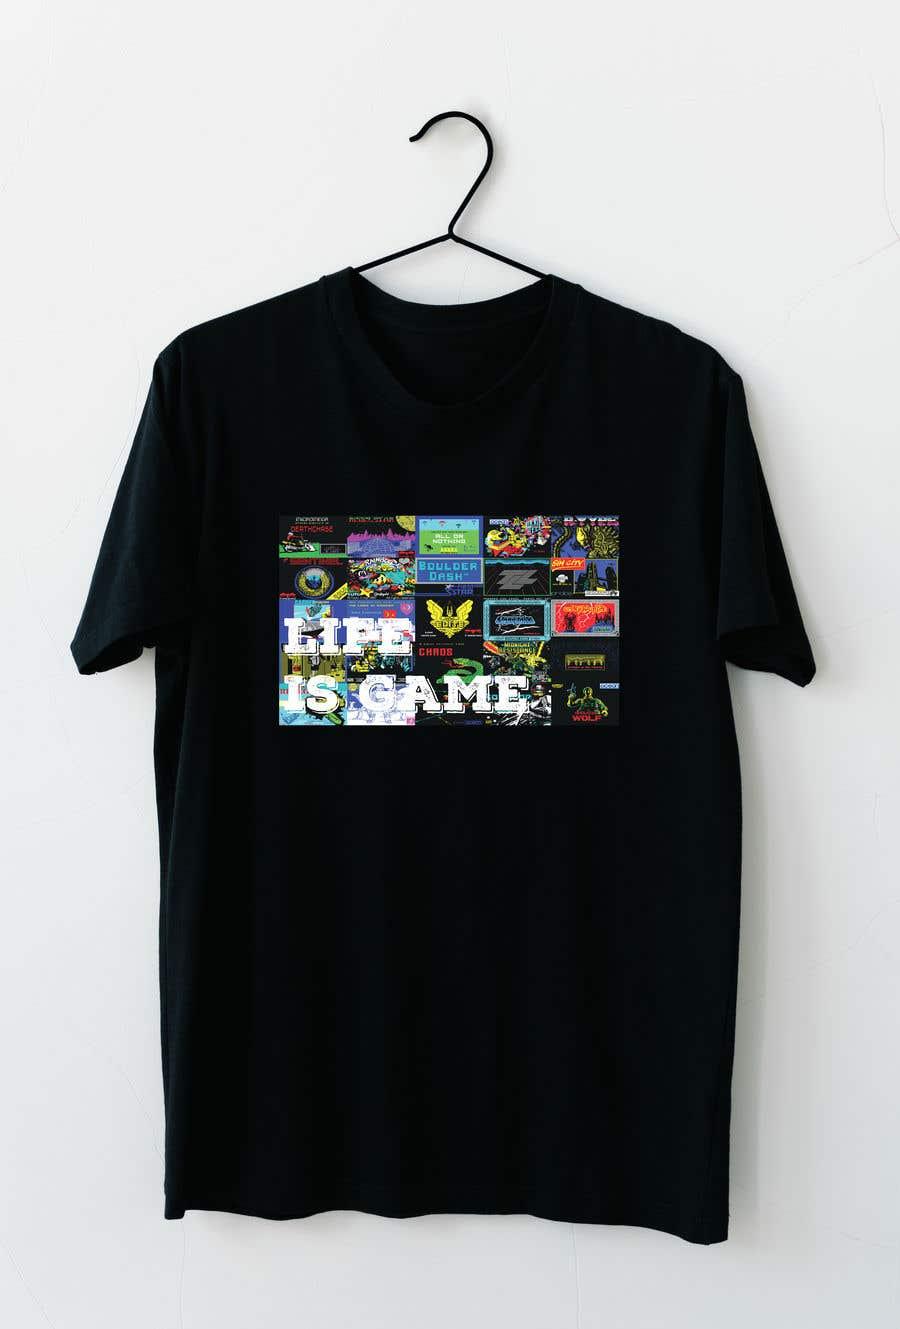 Proposition n°                                        95                                      du concours                                         make a modern t-shirt design for a retro computer